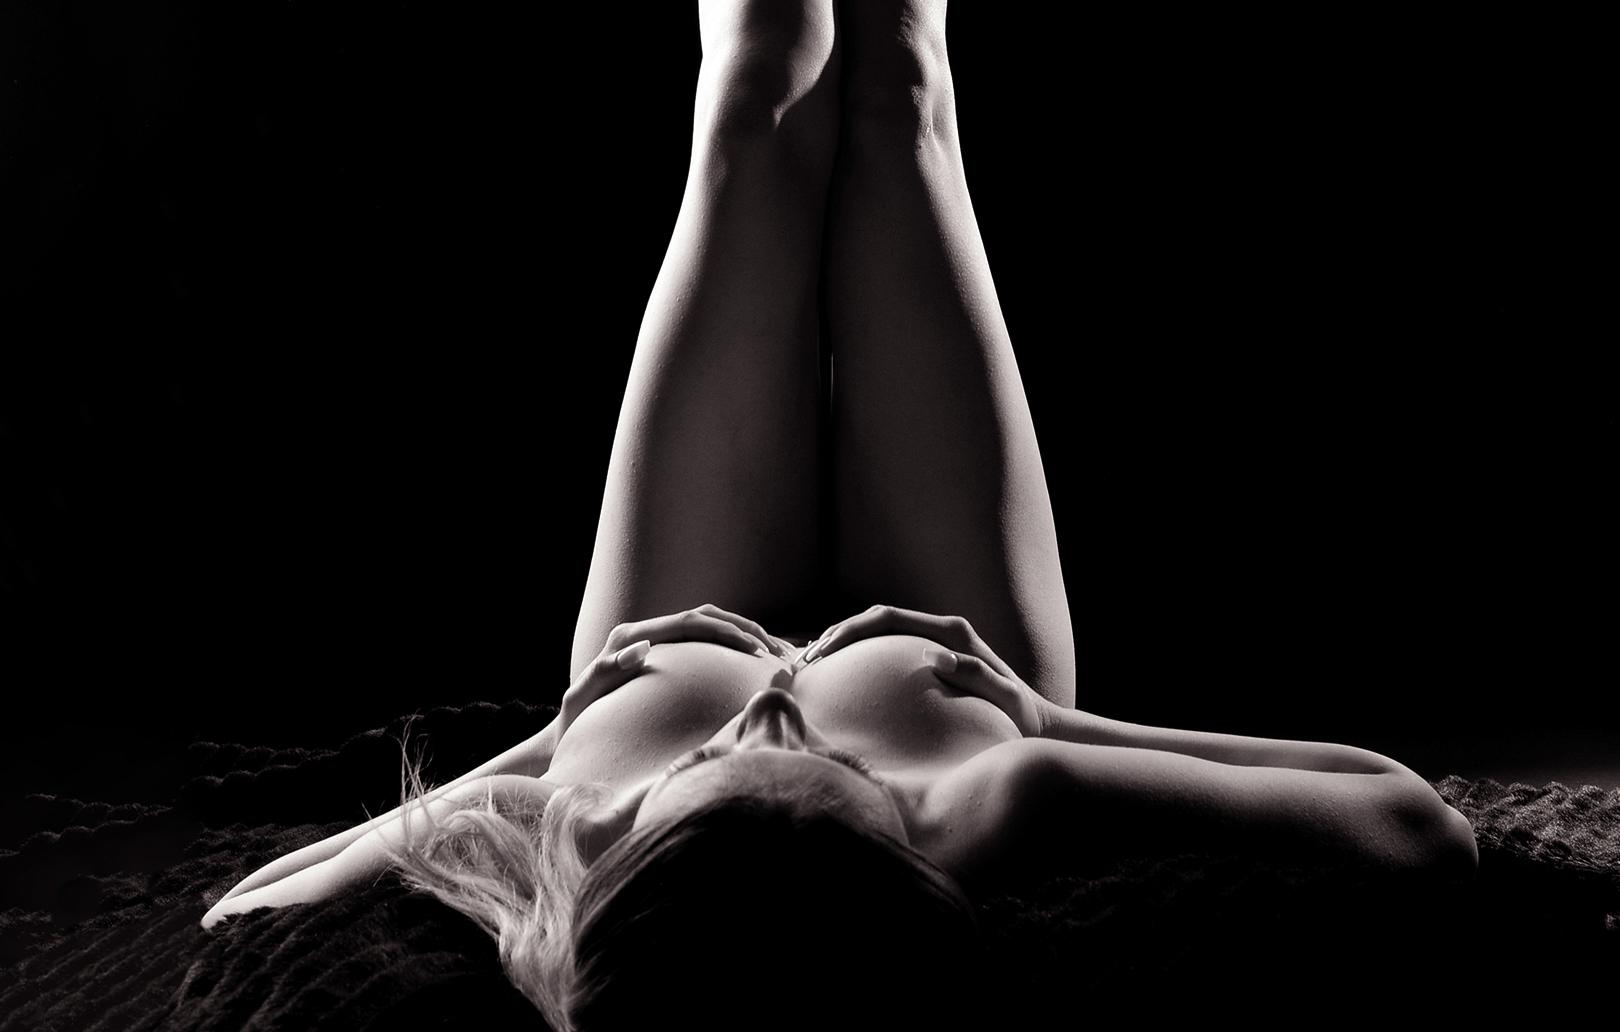 erotisches-fotoshooting-luebeck-bg11610534731